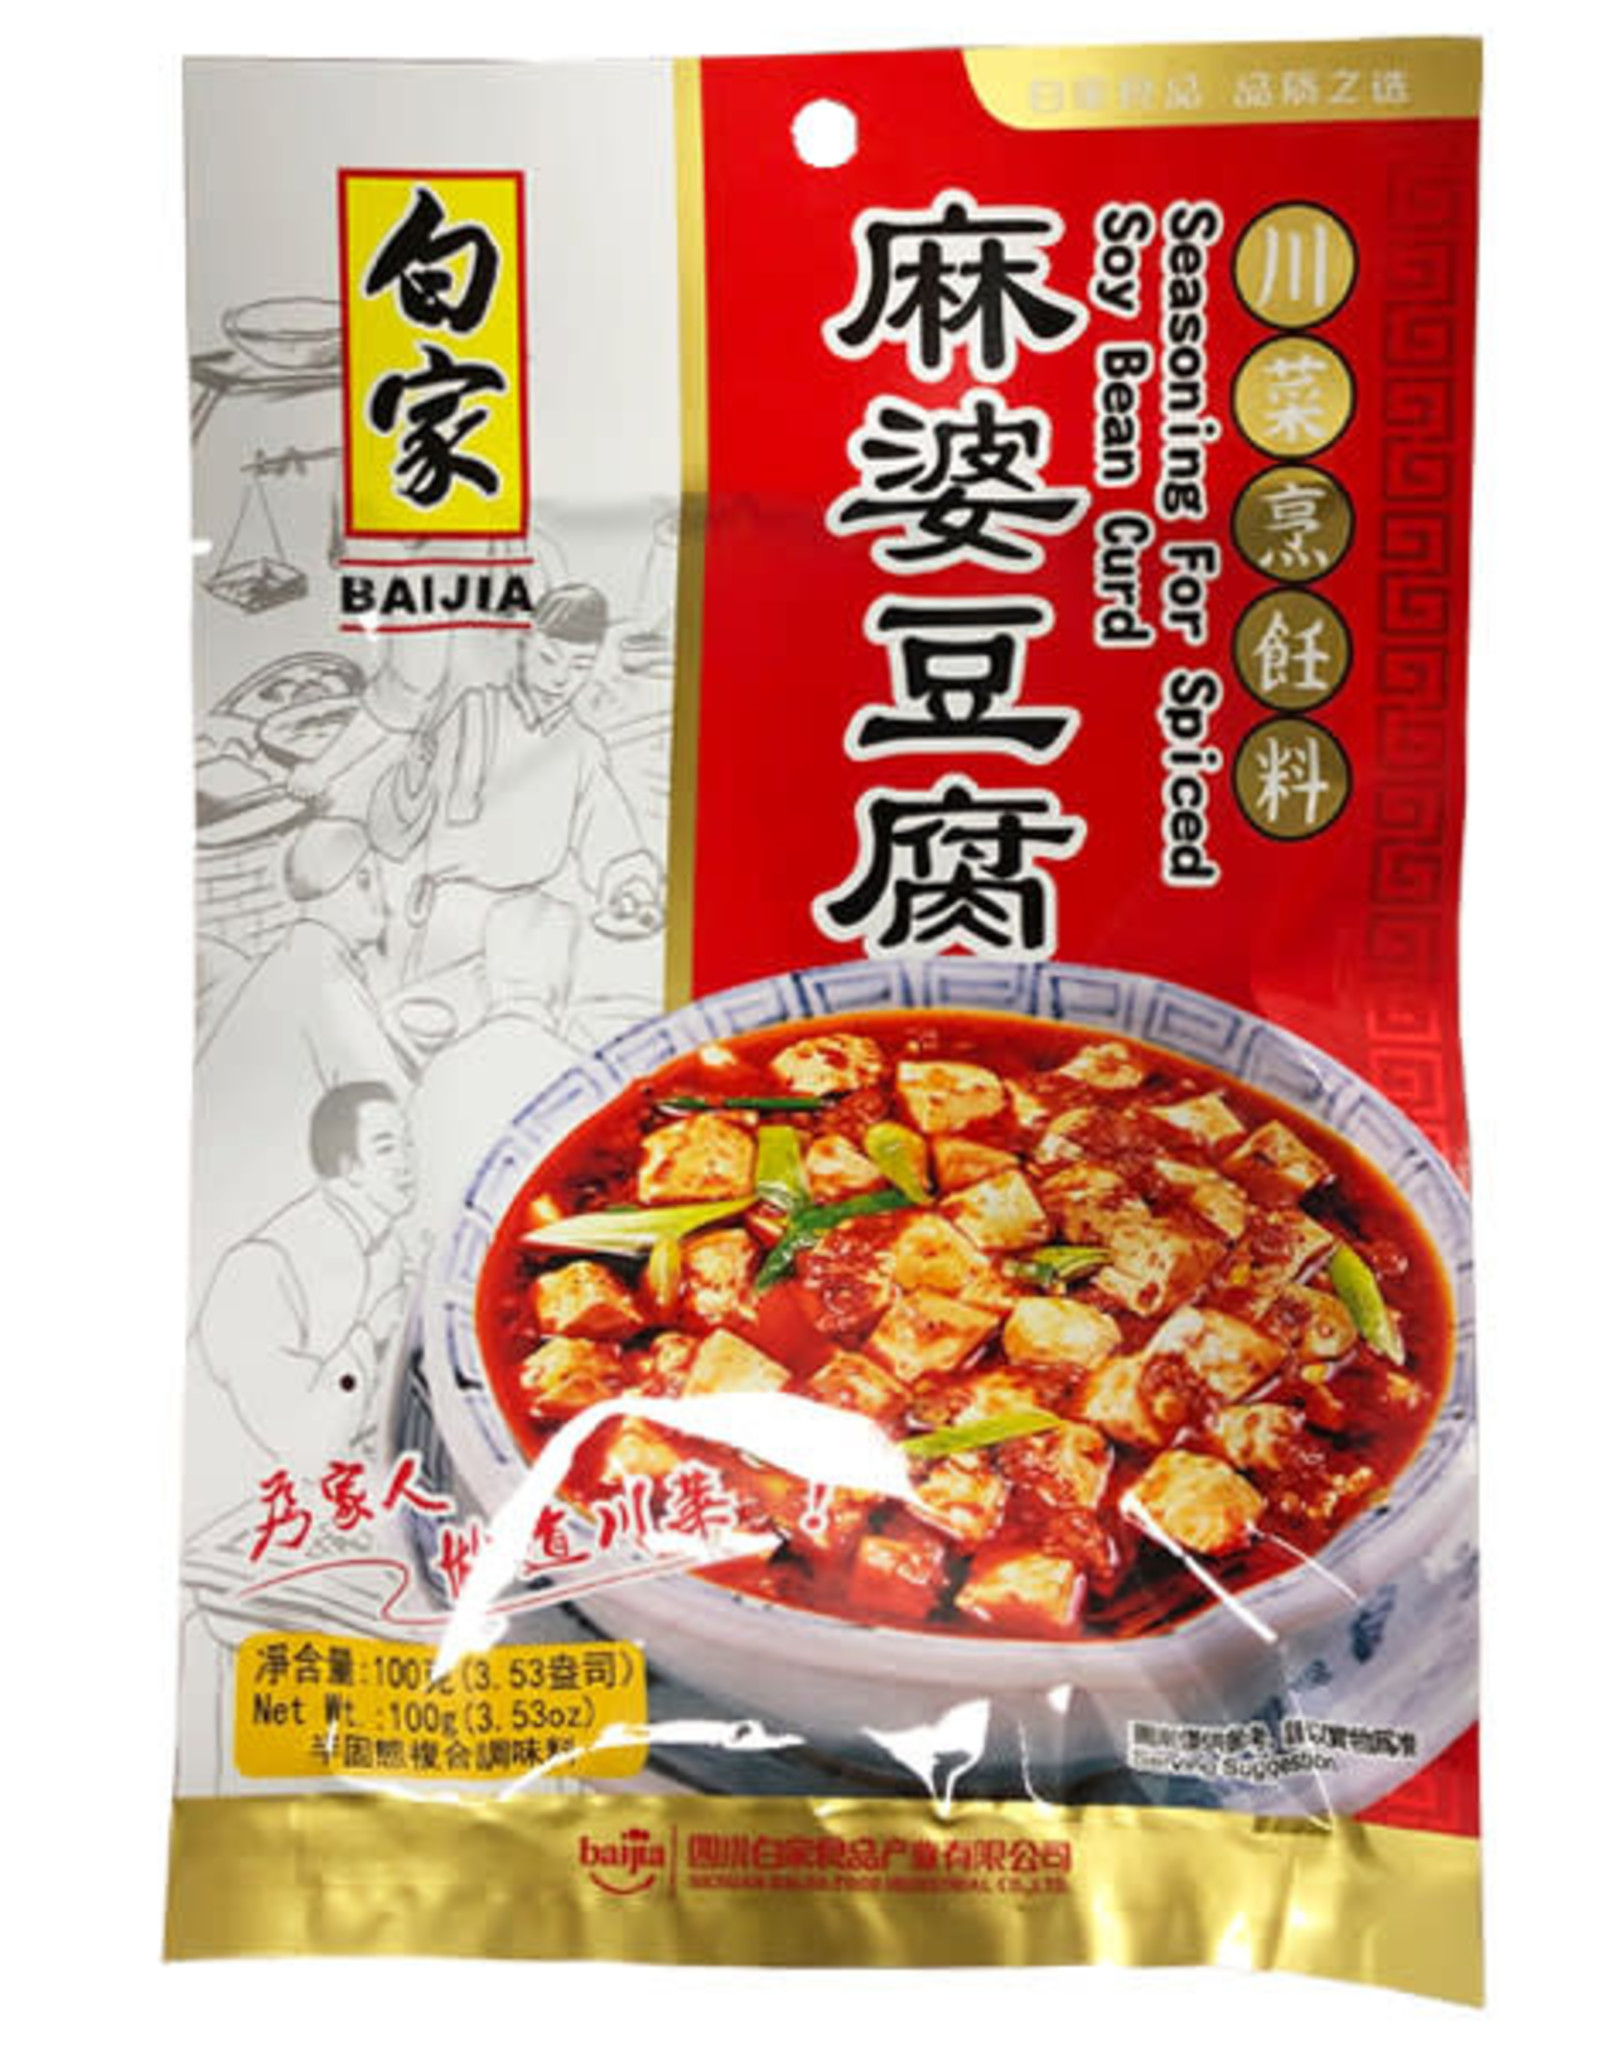 Ma Po Tofu Seasoning 100 Gr.  Baijia